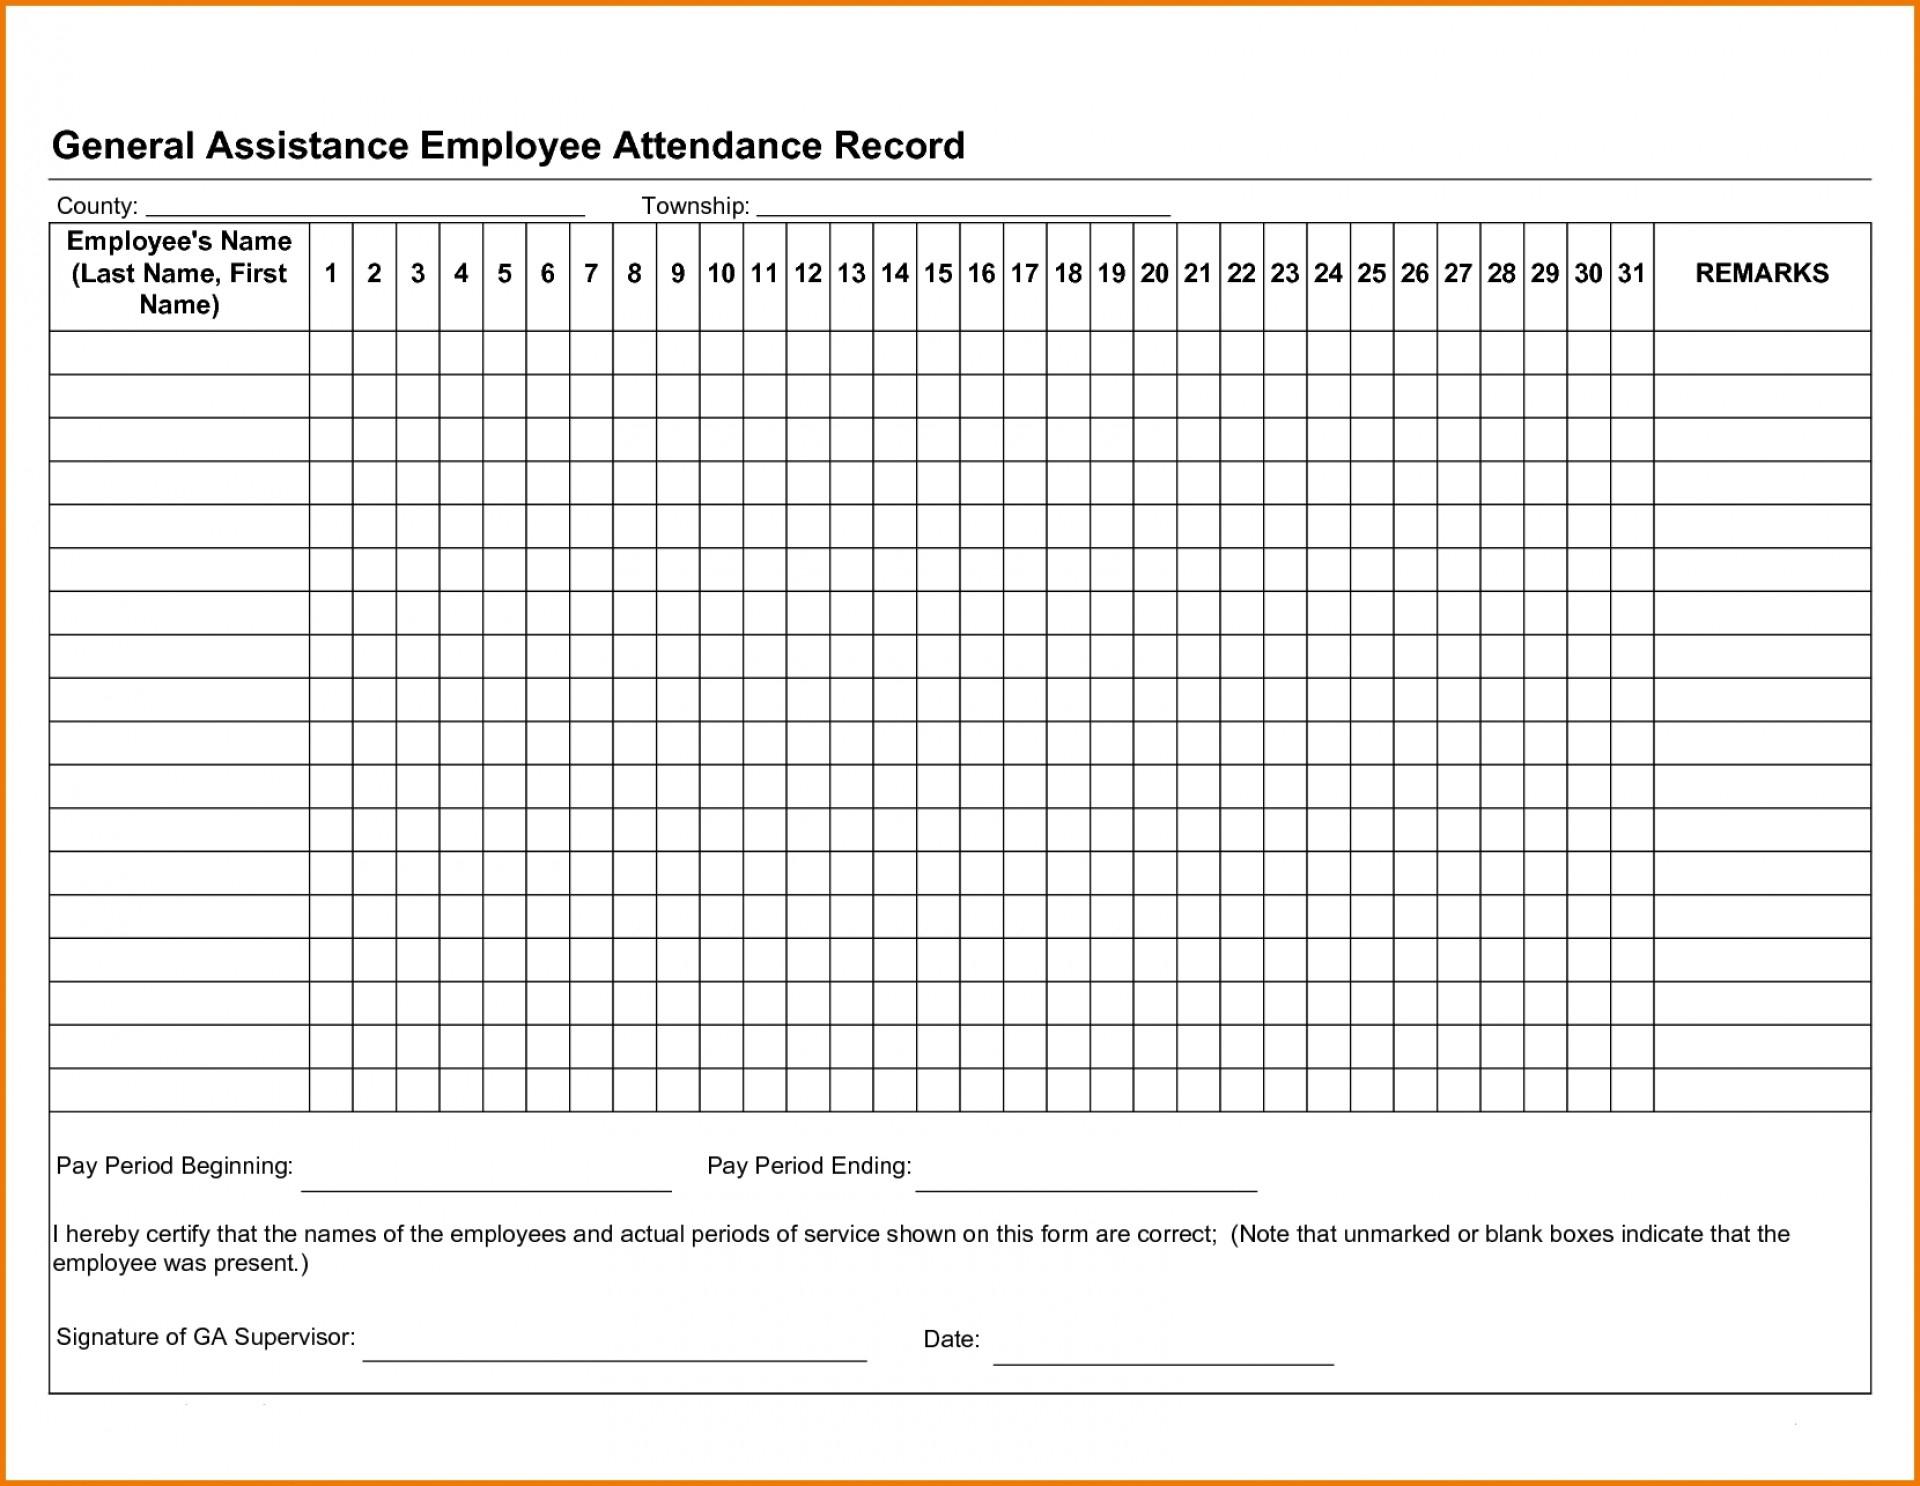 002 Employee Attendance Record Template Excel Maxresdefault